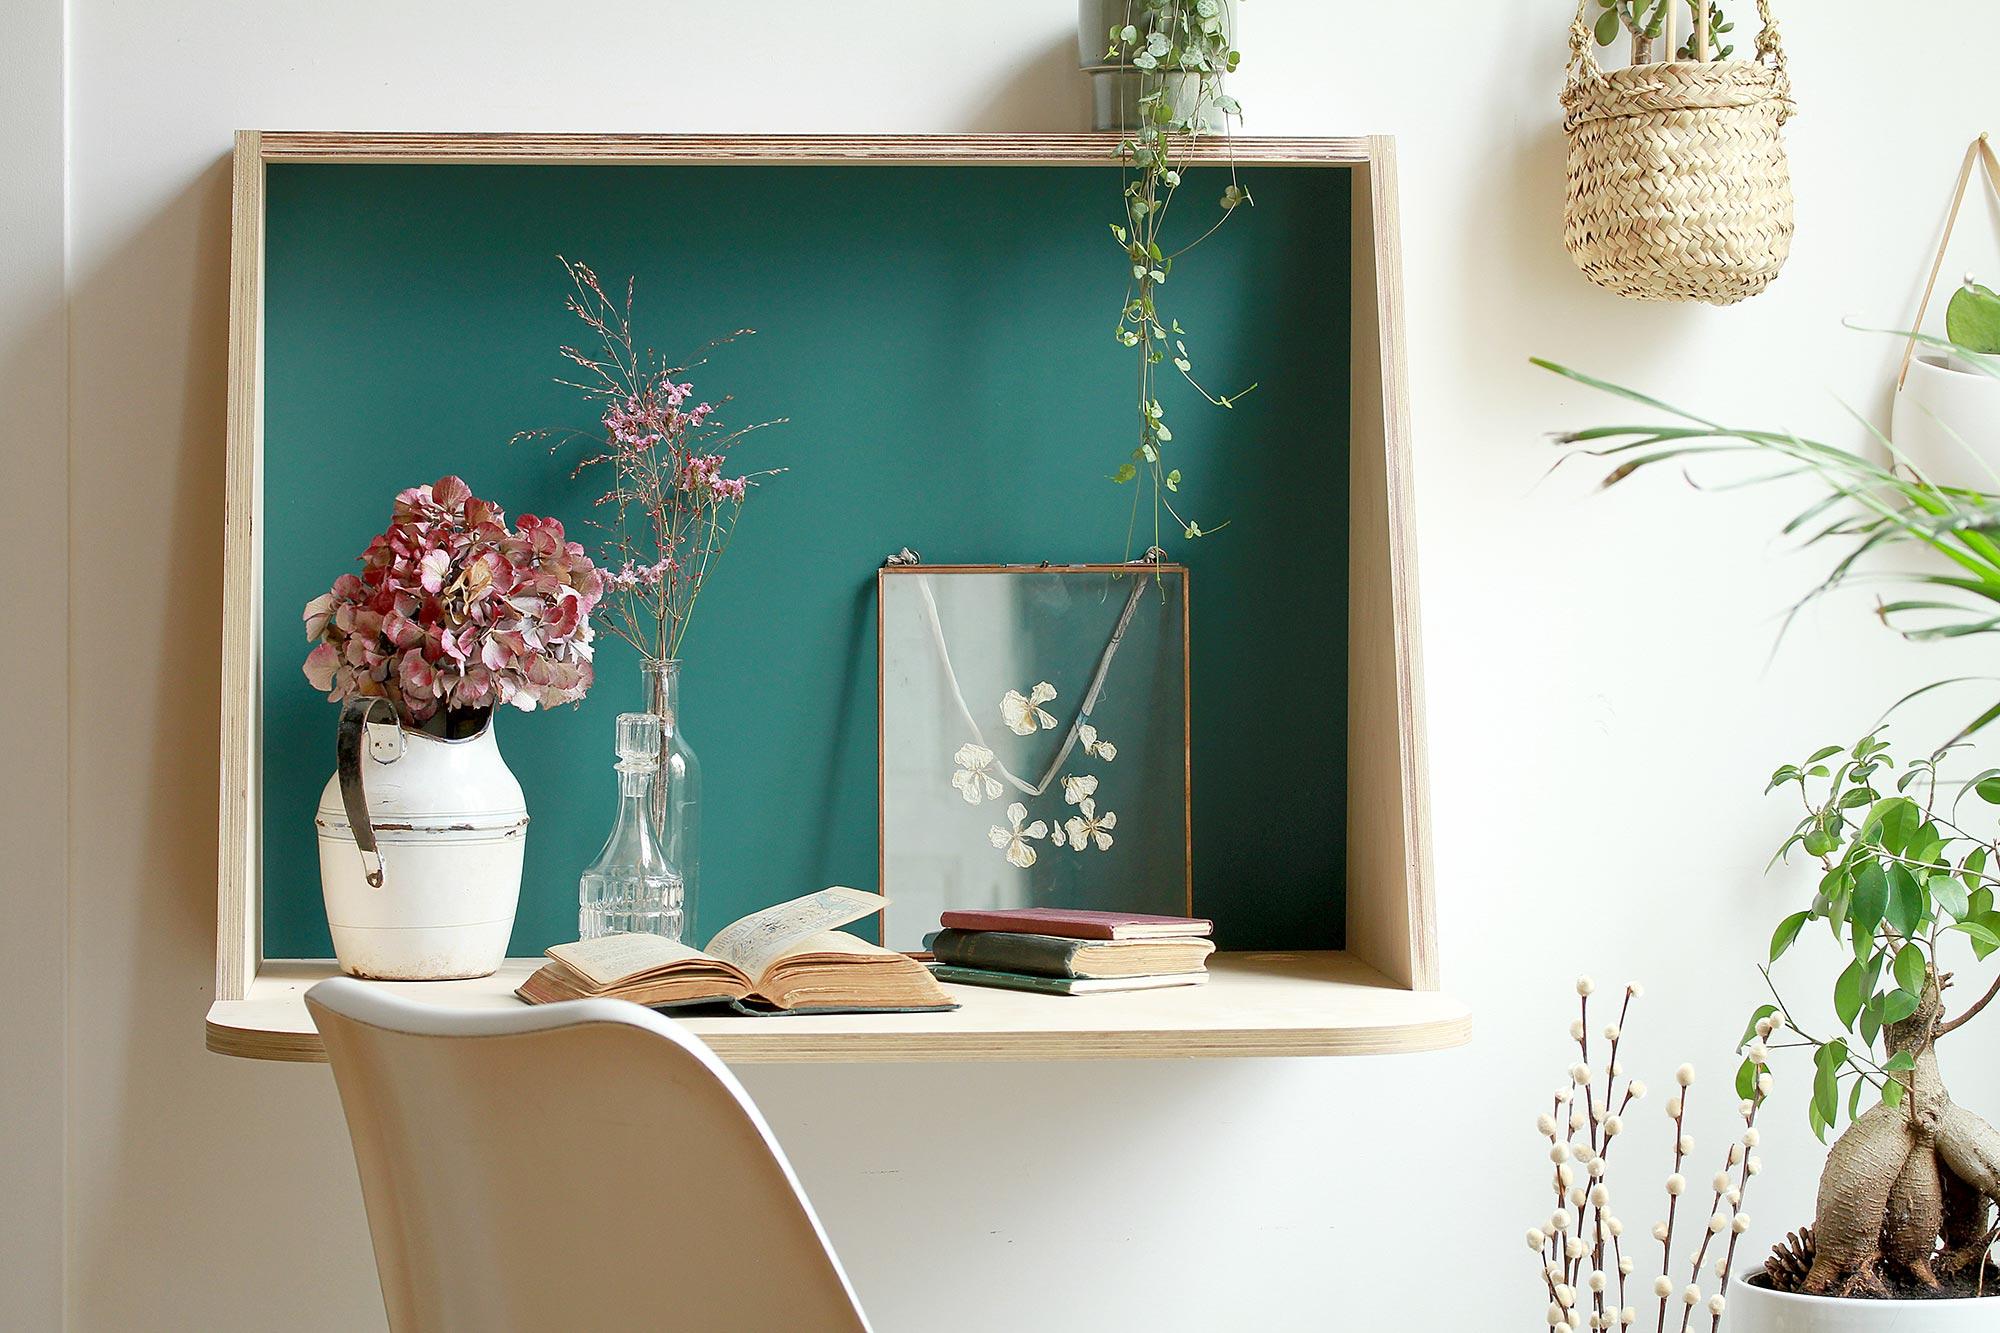 concept-store-influences-lyon-bureau-console-appoint-entree-minimaliste-suspendu-made-in-france-bouleau